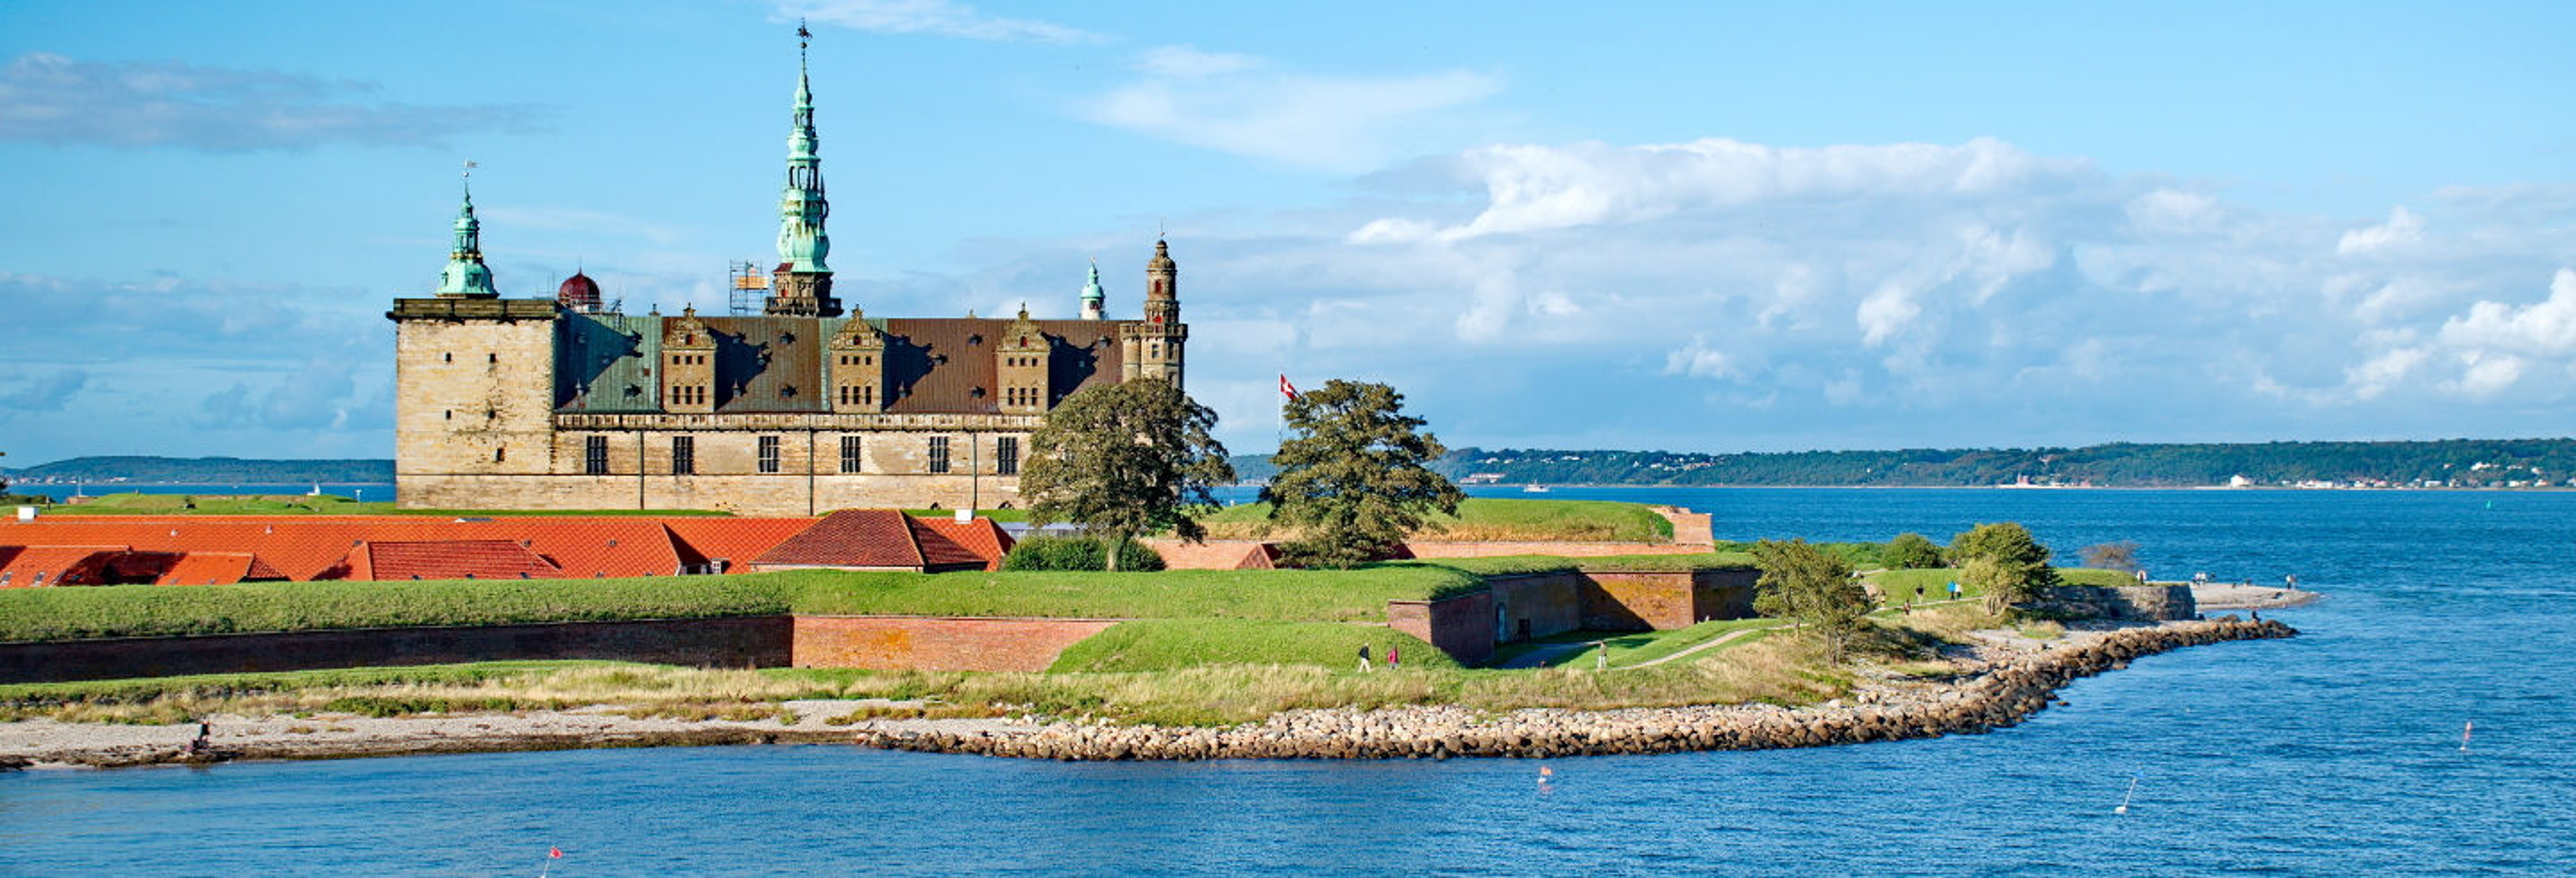 Castillos de Kronborg,Frederiksborg yFredensborg